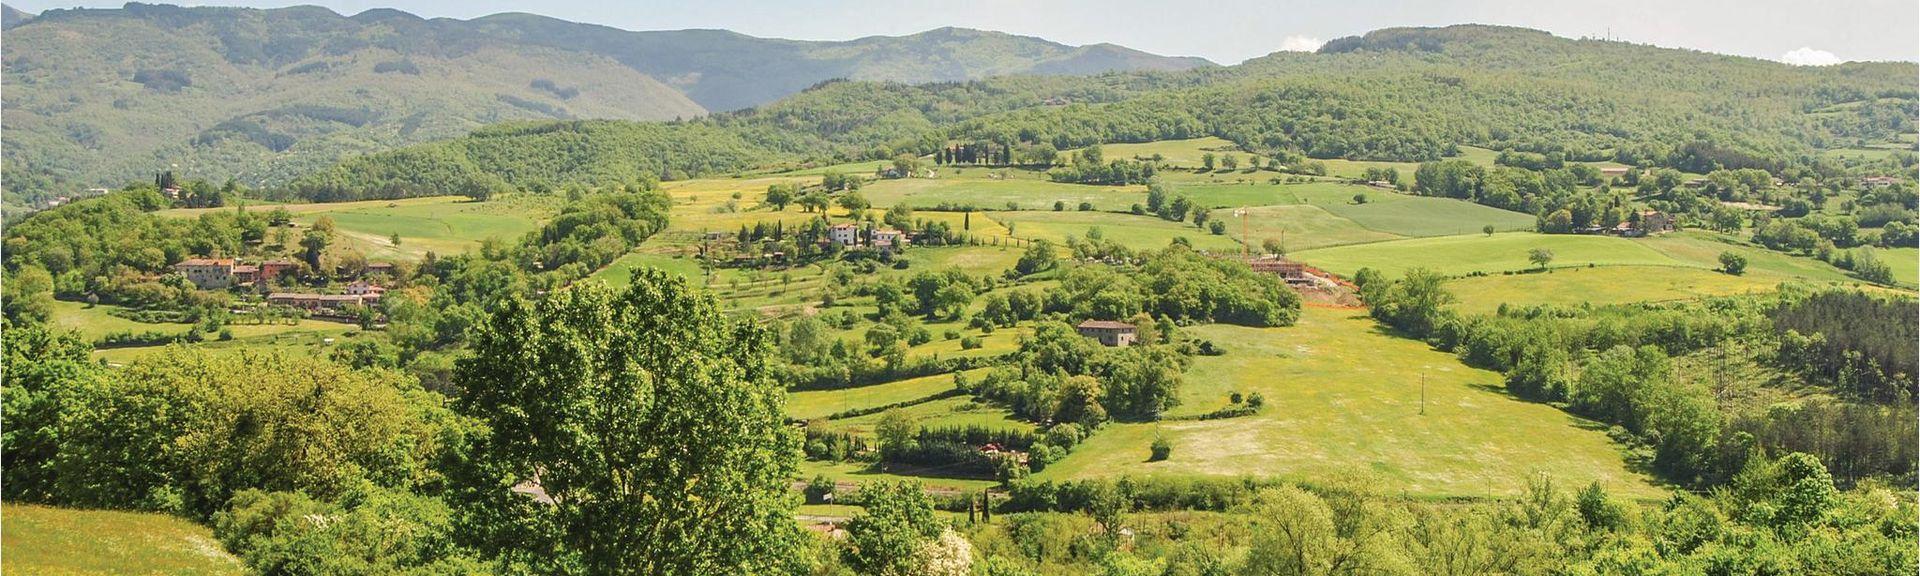 Monterchi, Toscana, Itália